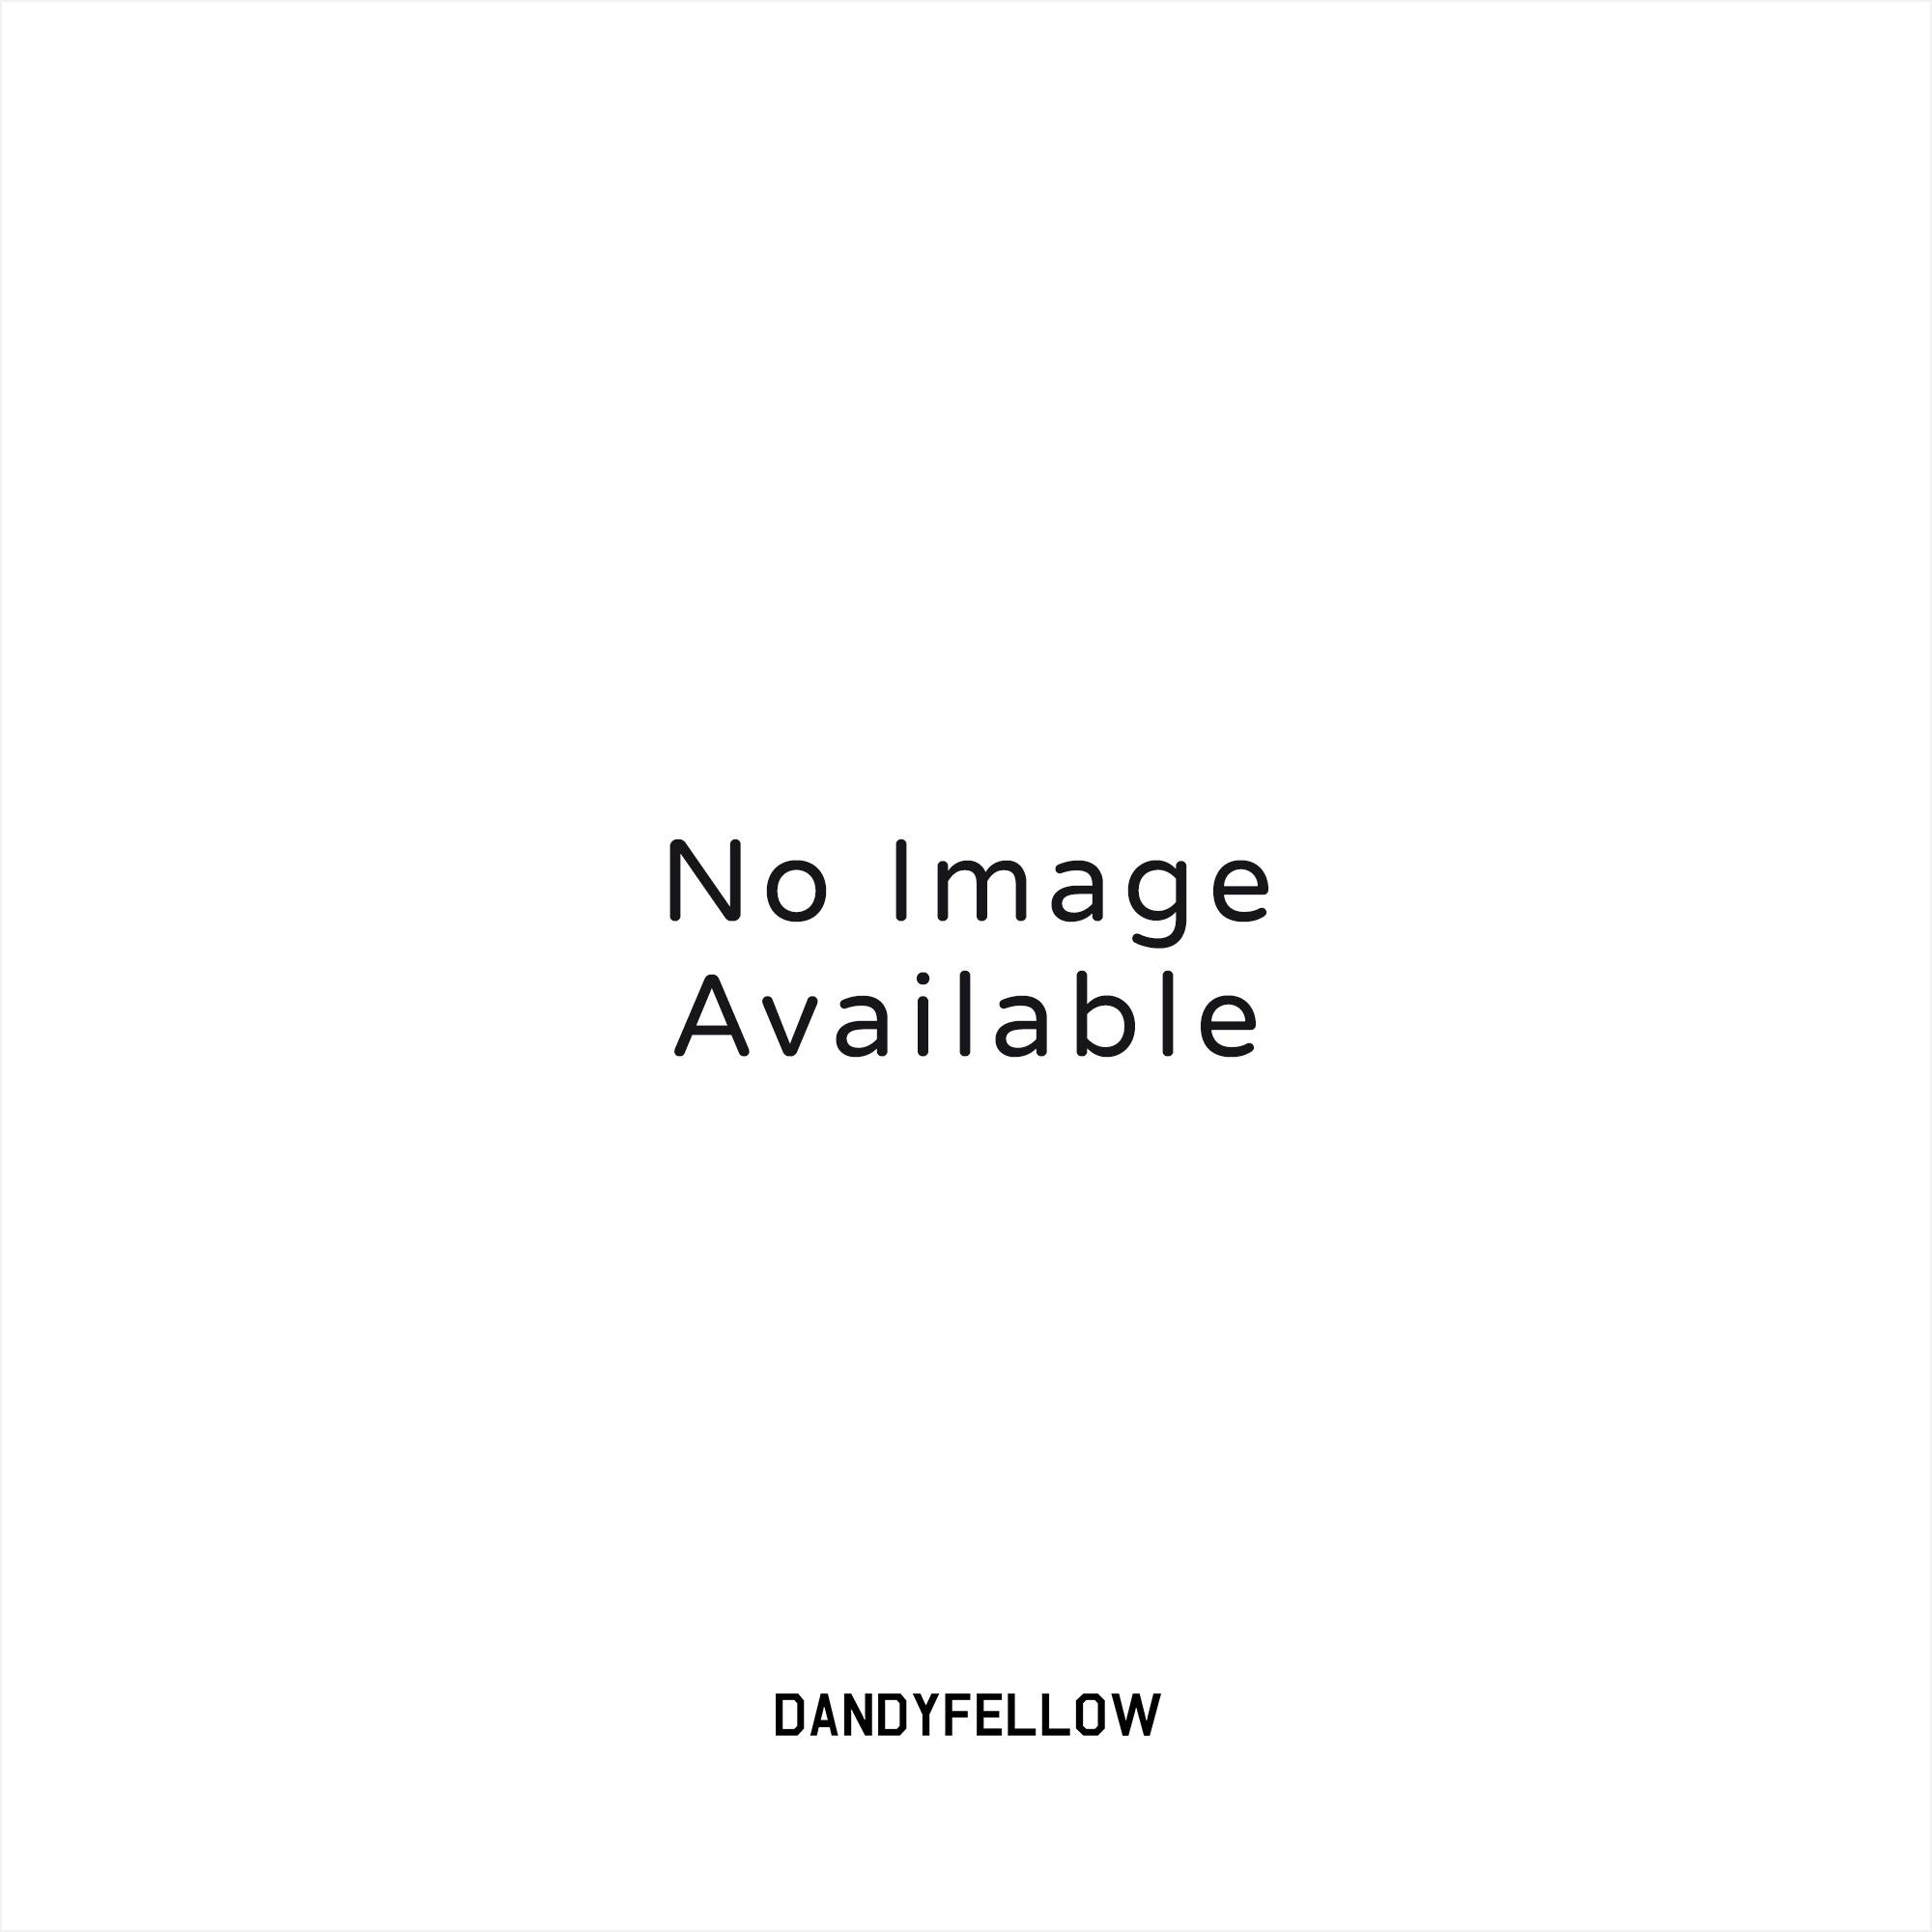 frase Ensangrentado lo hizo  Adidas White Authentic Rugby Jersey DH3844 | Dandy Fellow